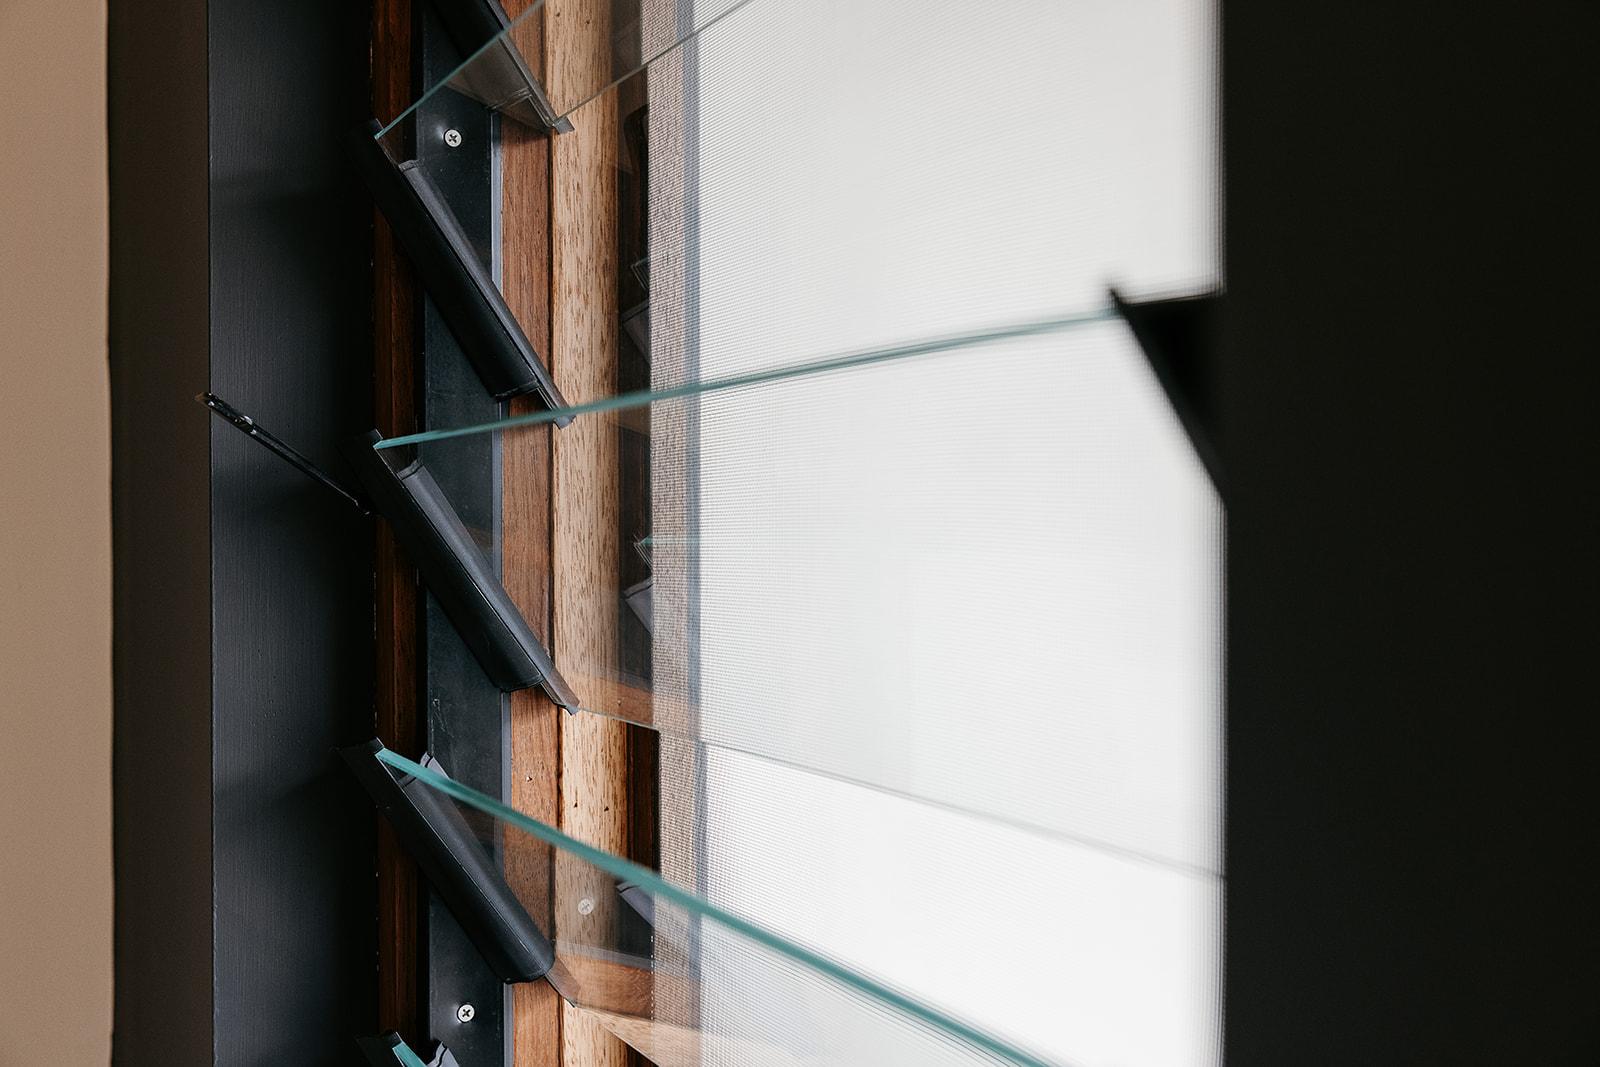 Glass louvre blades window close up